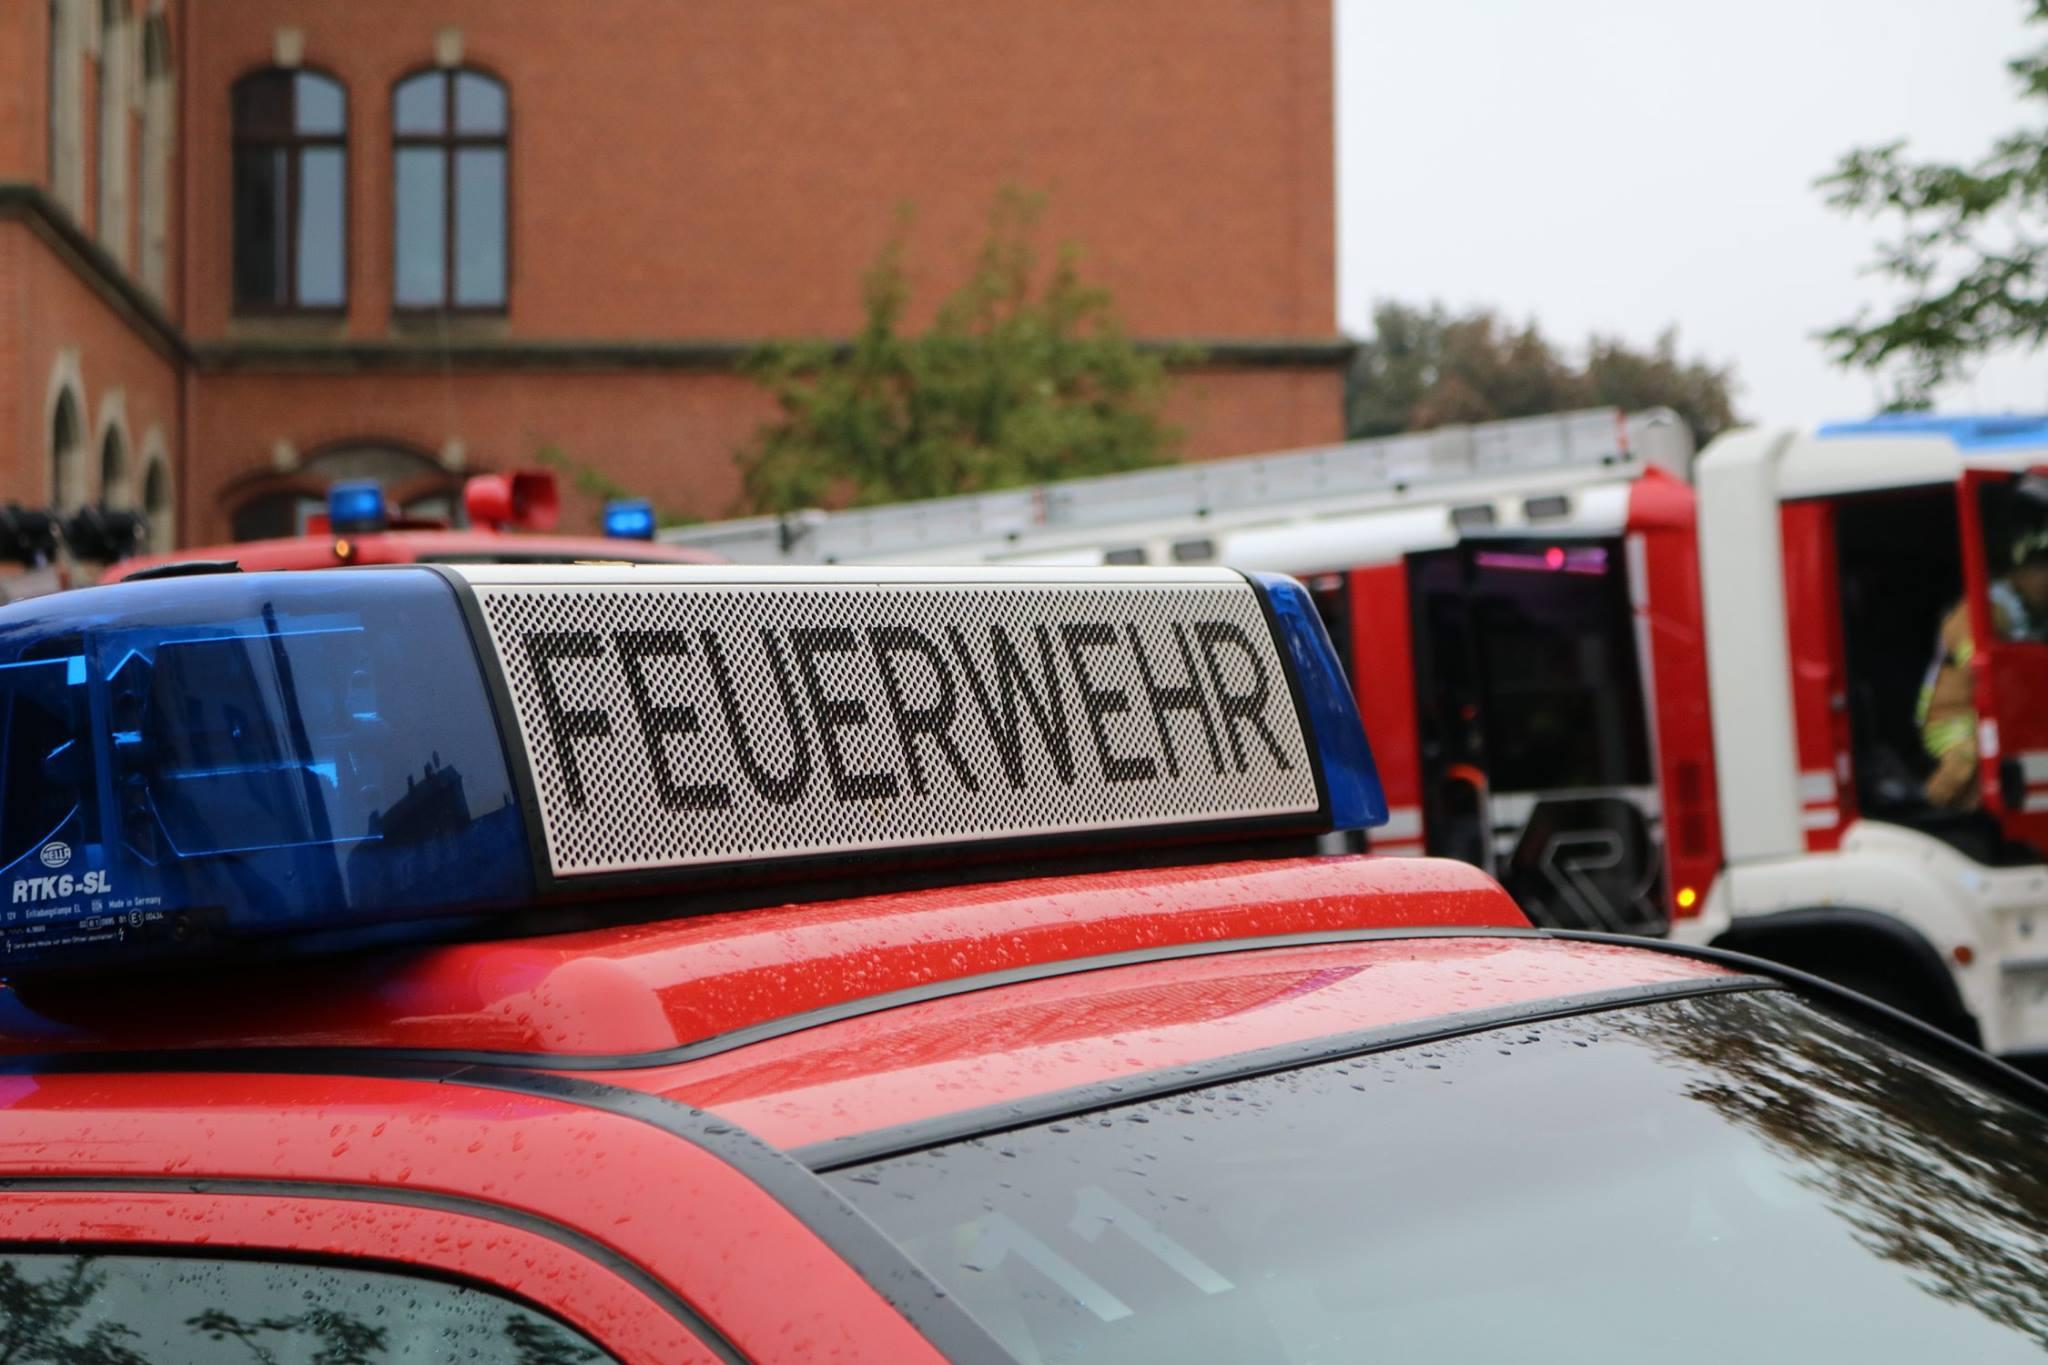 Wohnungsbrand in Zeulenroda